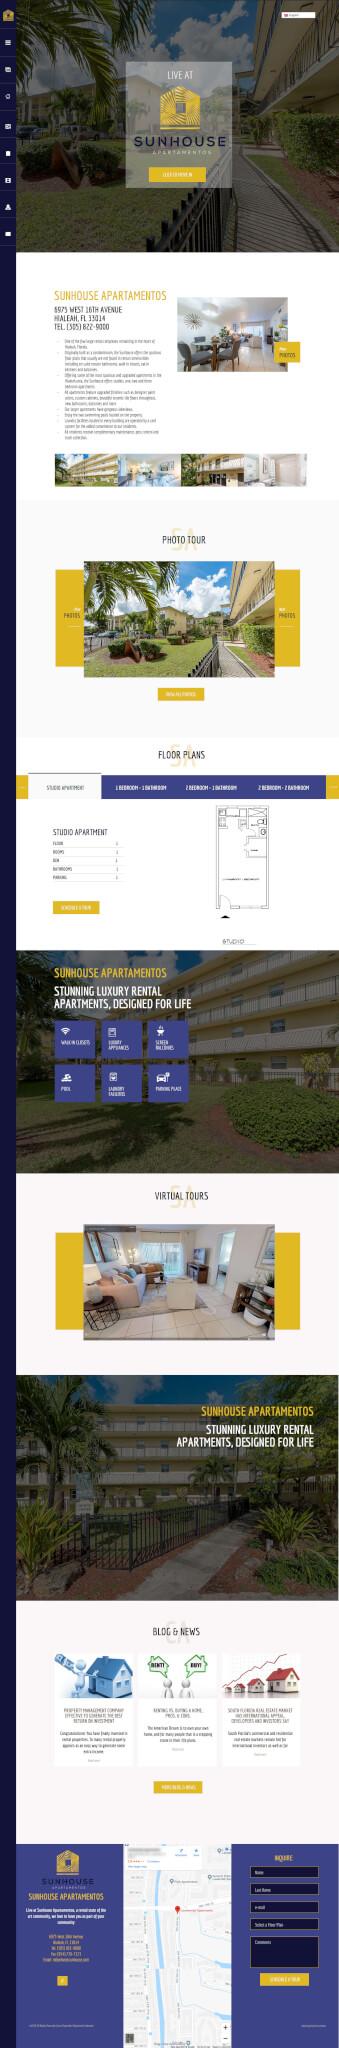 WPML Multilingual Web Sites WordPress-2